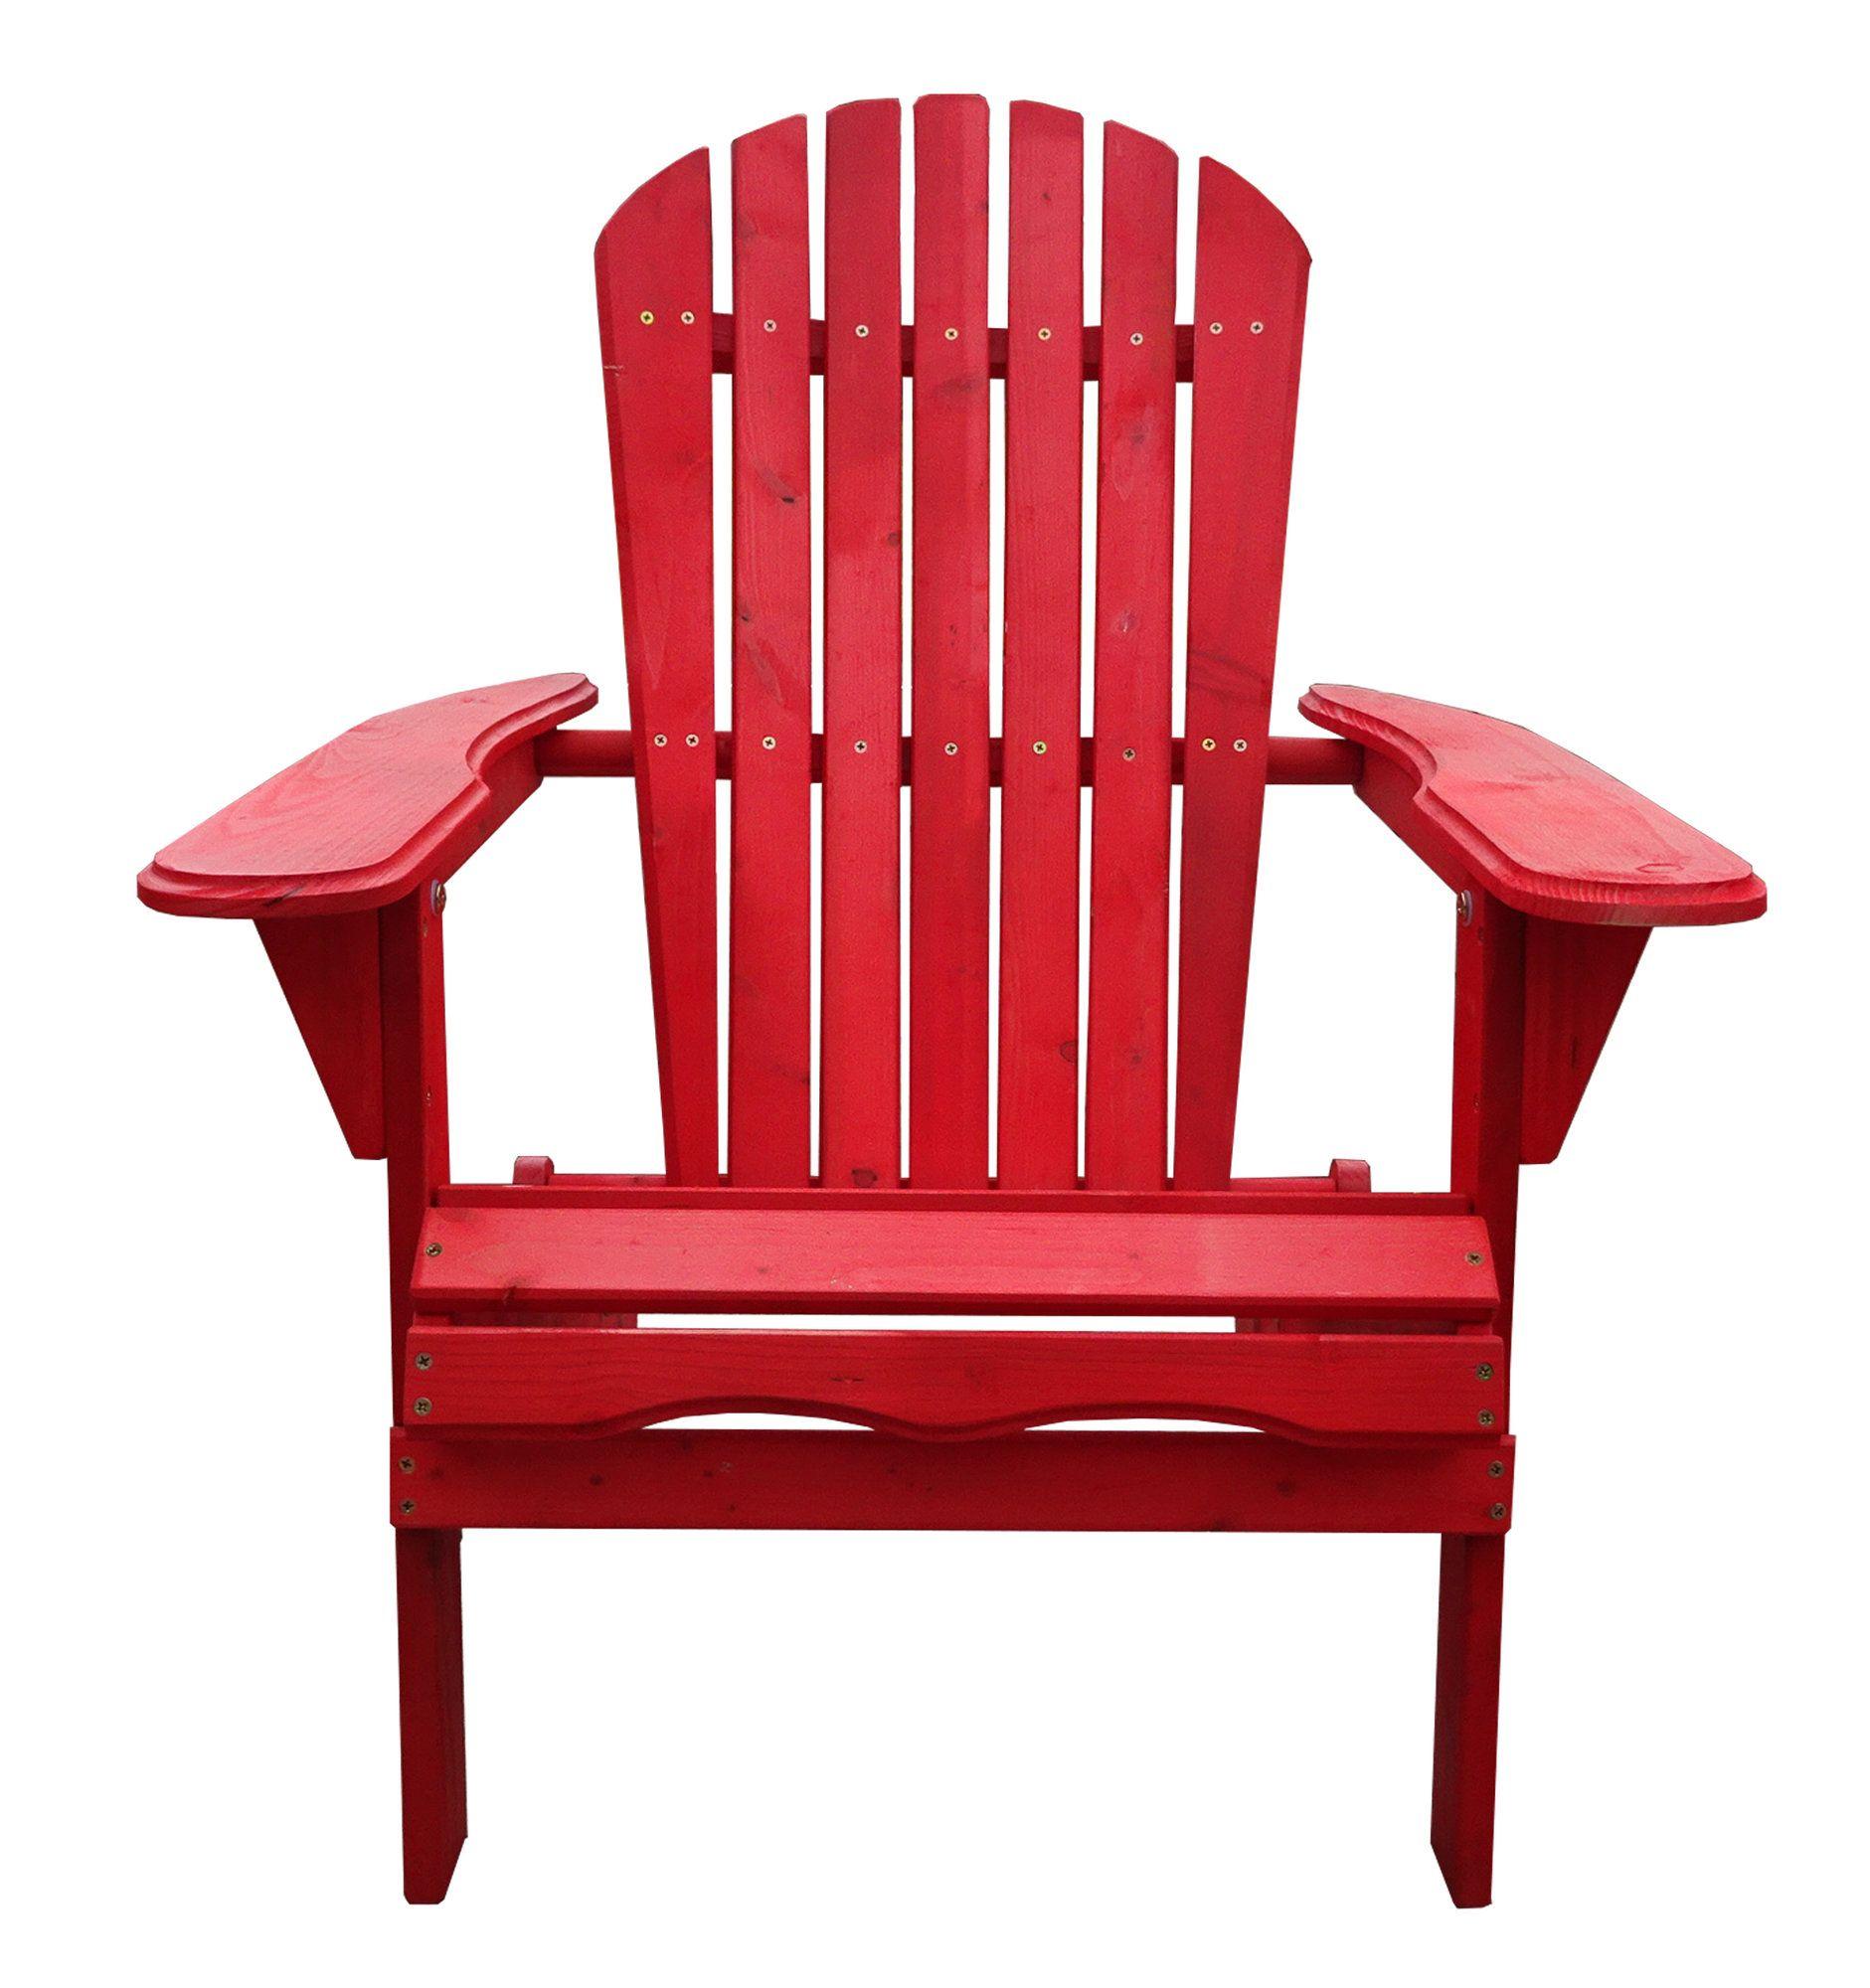 Albia adirondack chair products pinterest adirondack chairs